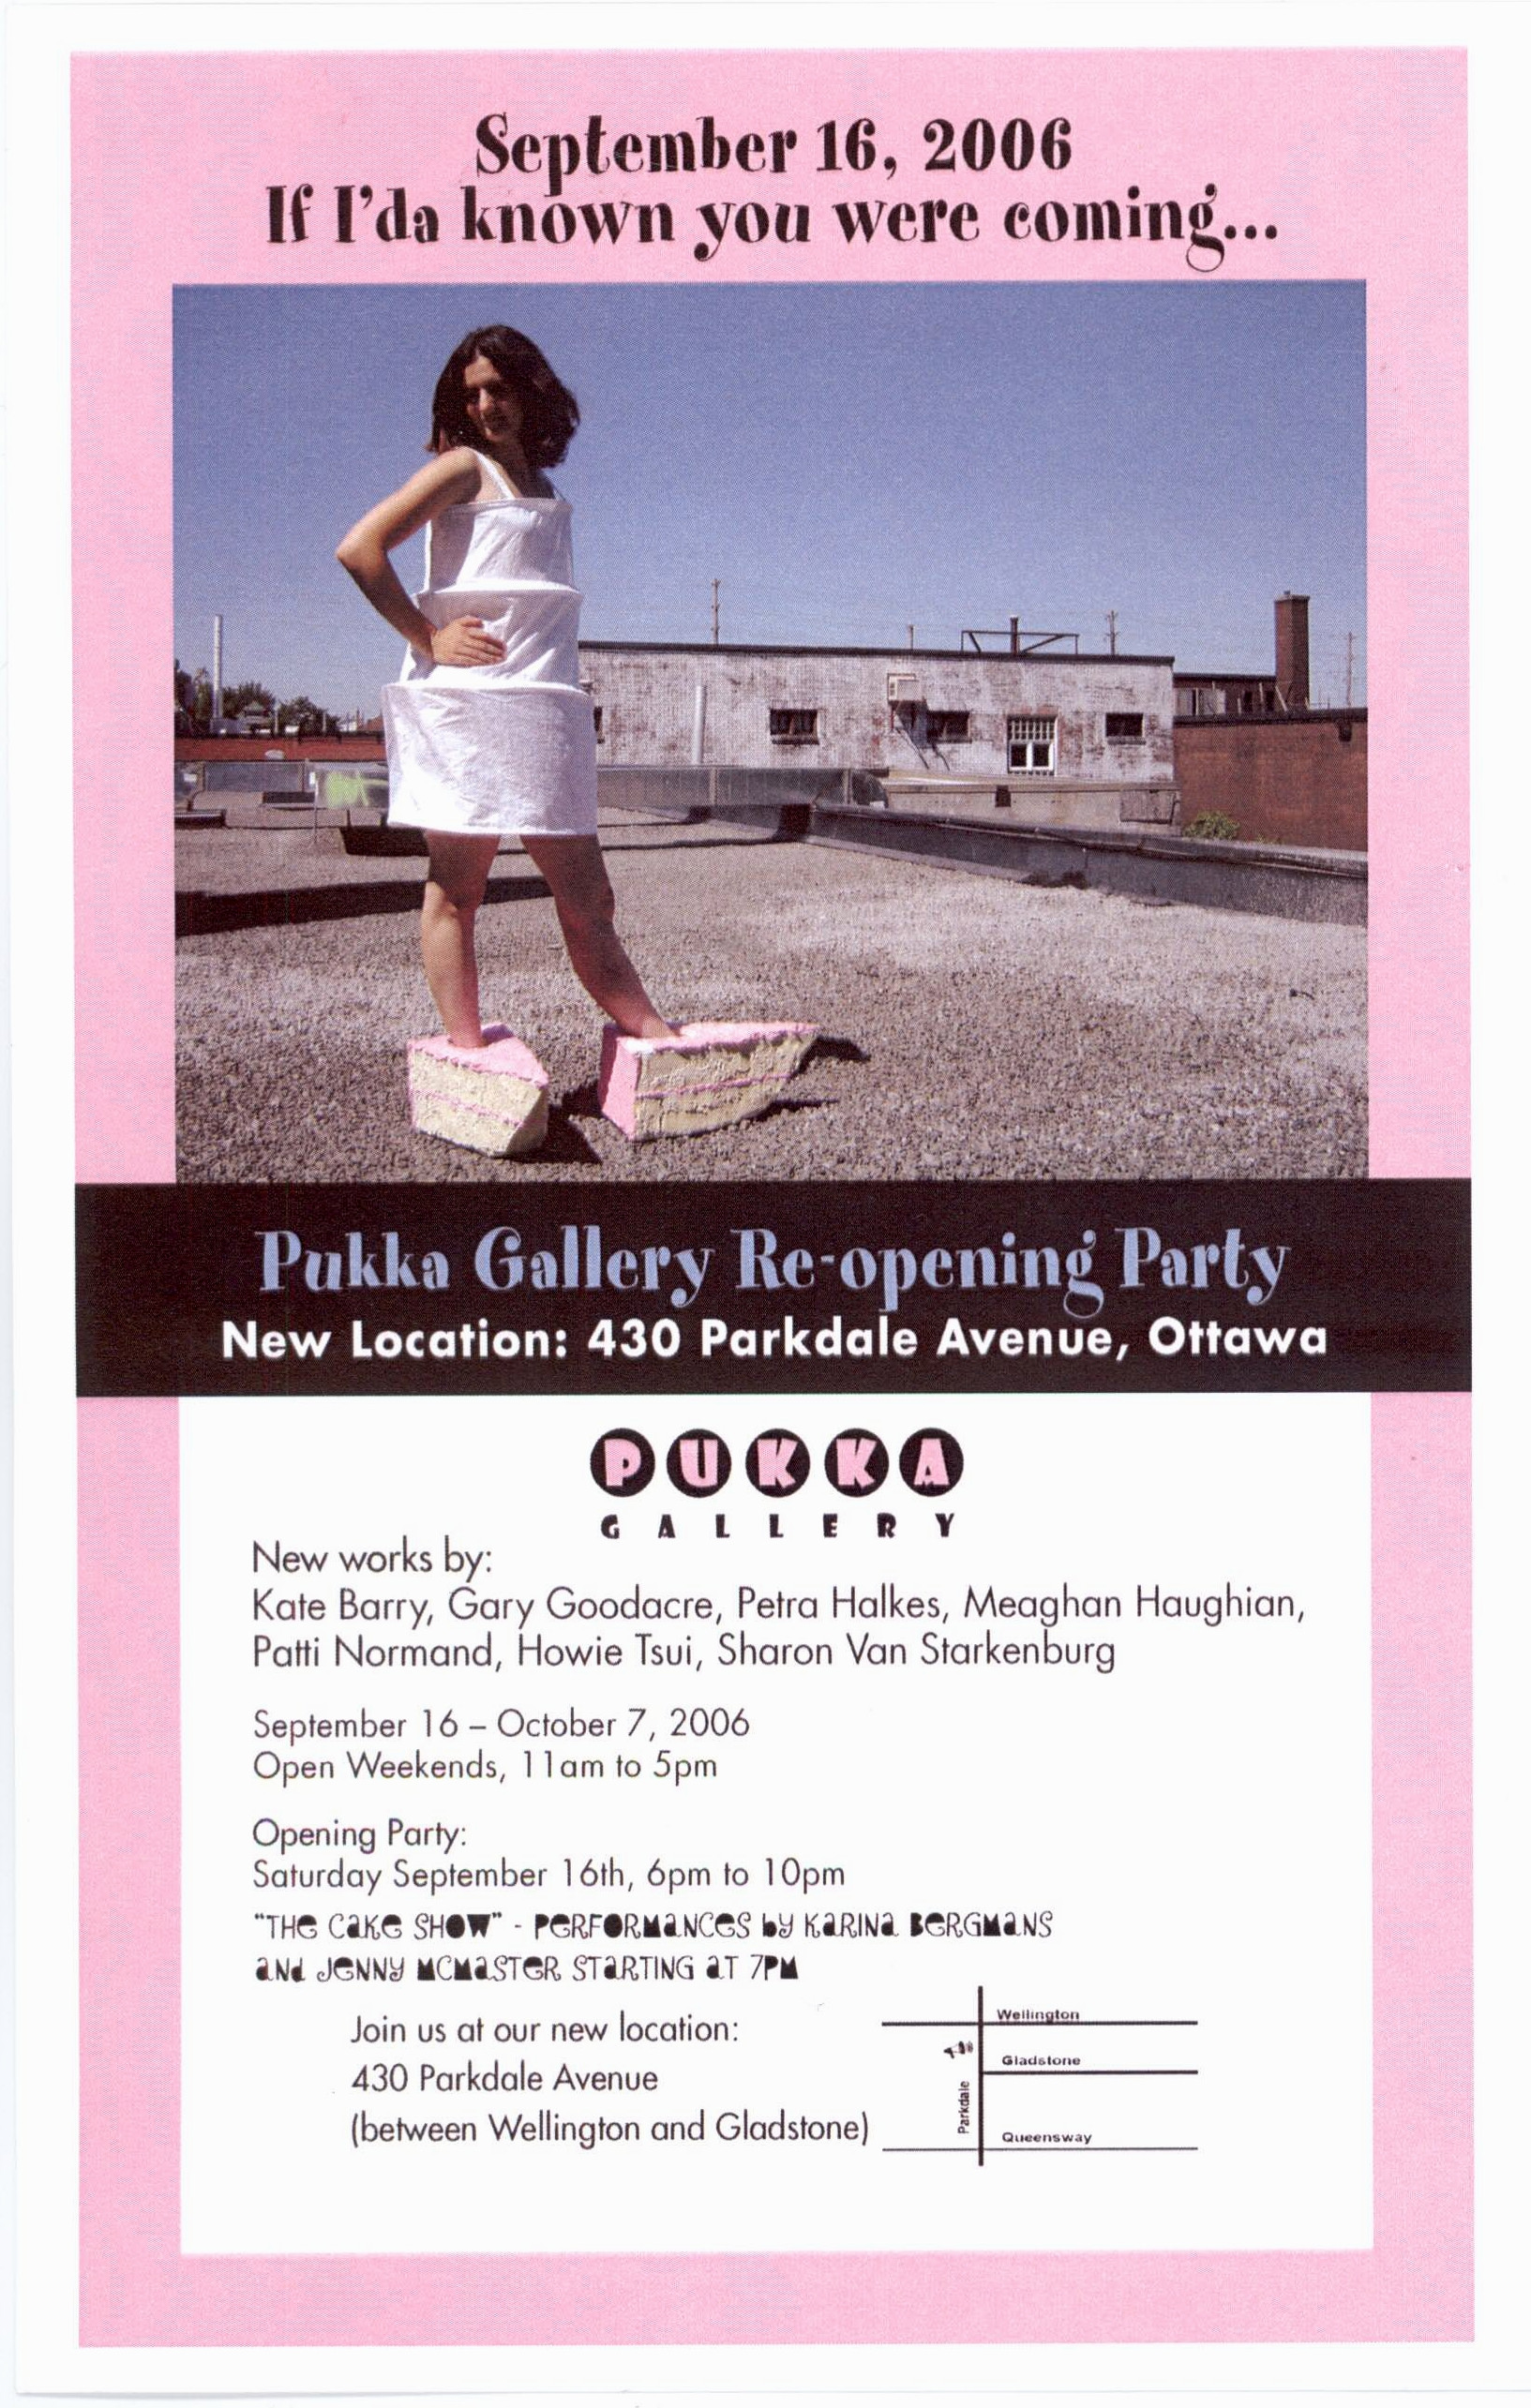 Cake Show at Pukka